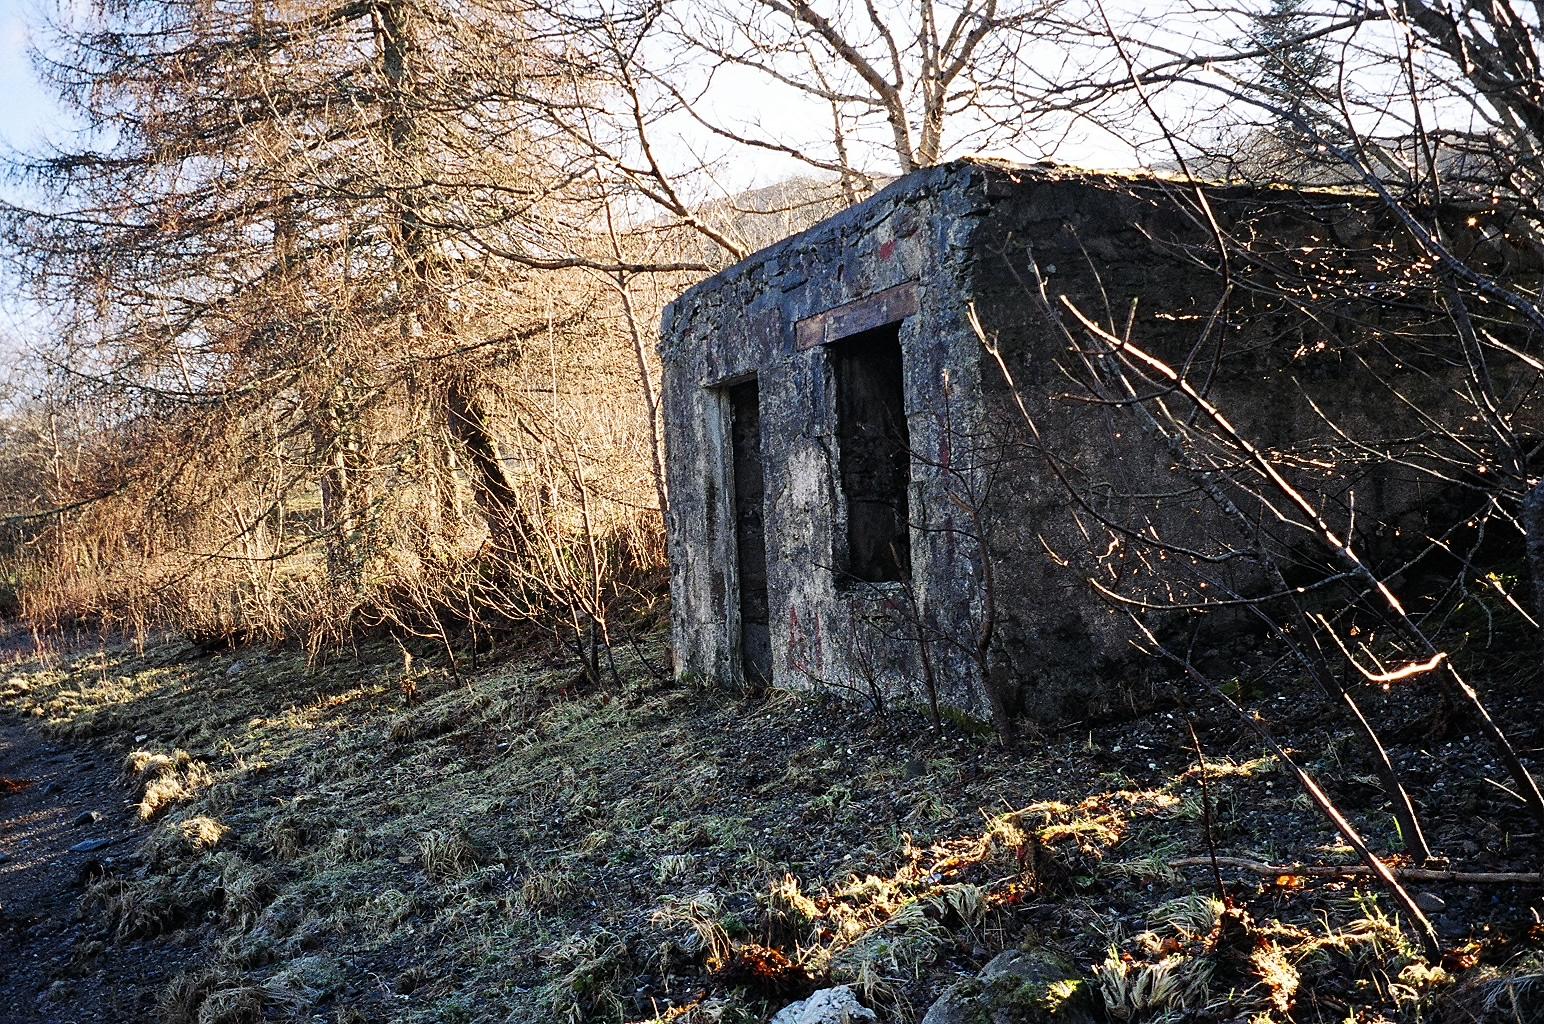 Bathing Hut